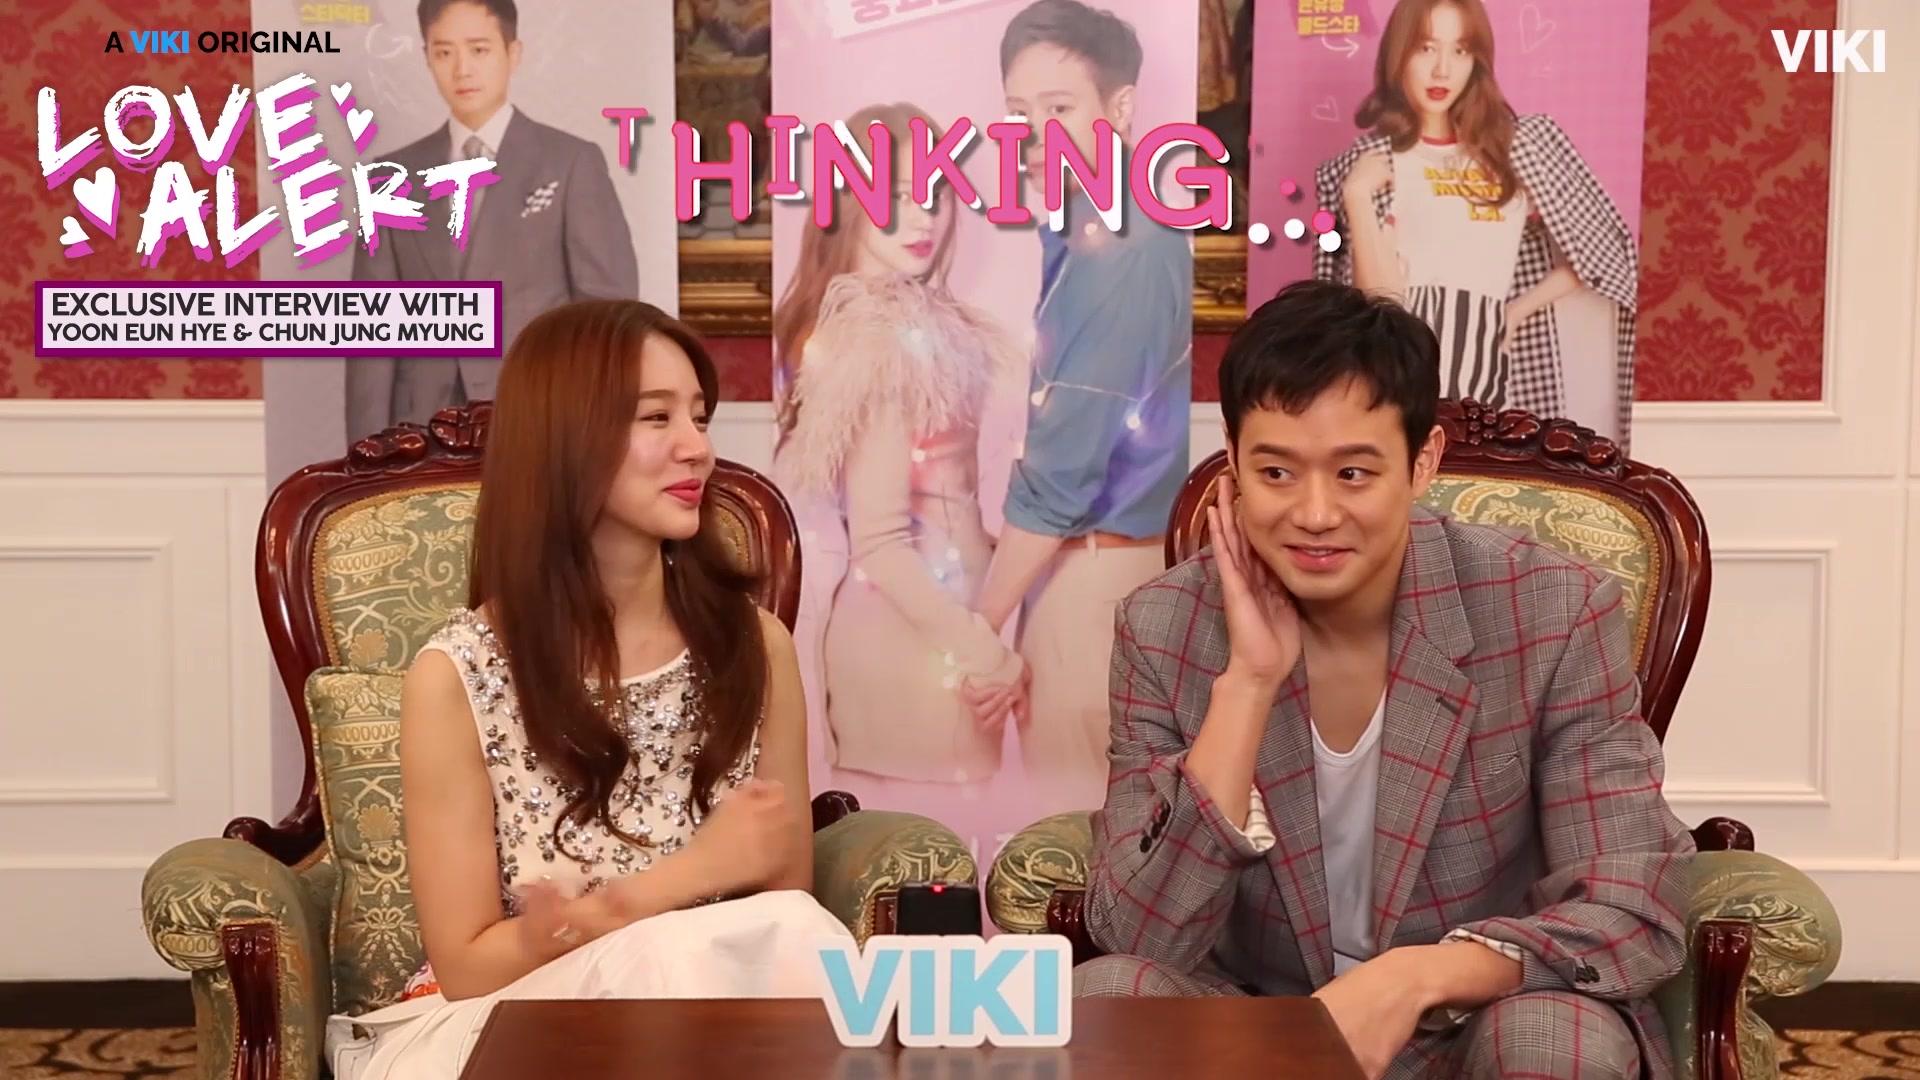 Exclusive Interview With the Cast: Alerta de amor